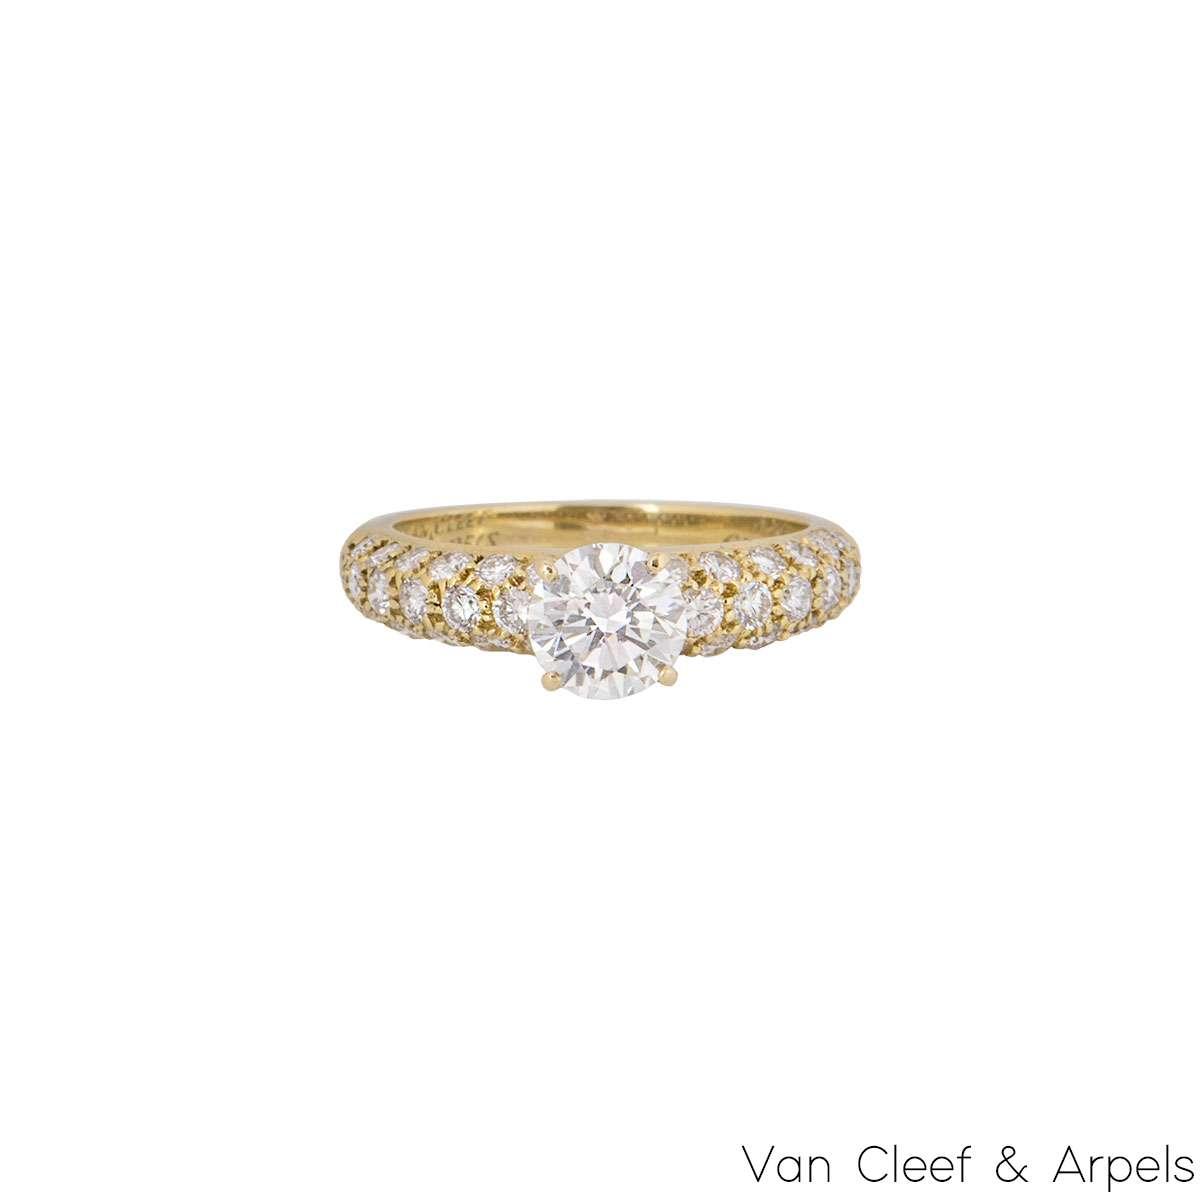 Van Cleef & Arpels 18k Yellow Gold Diamond Ring 0.79ct